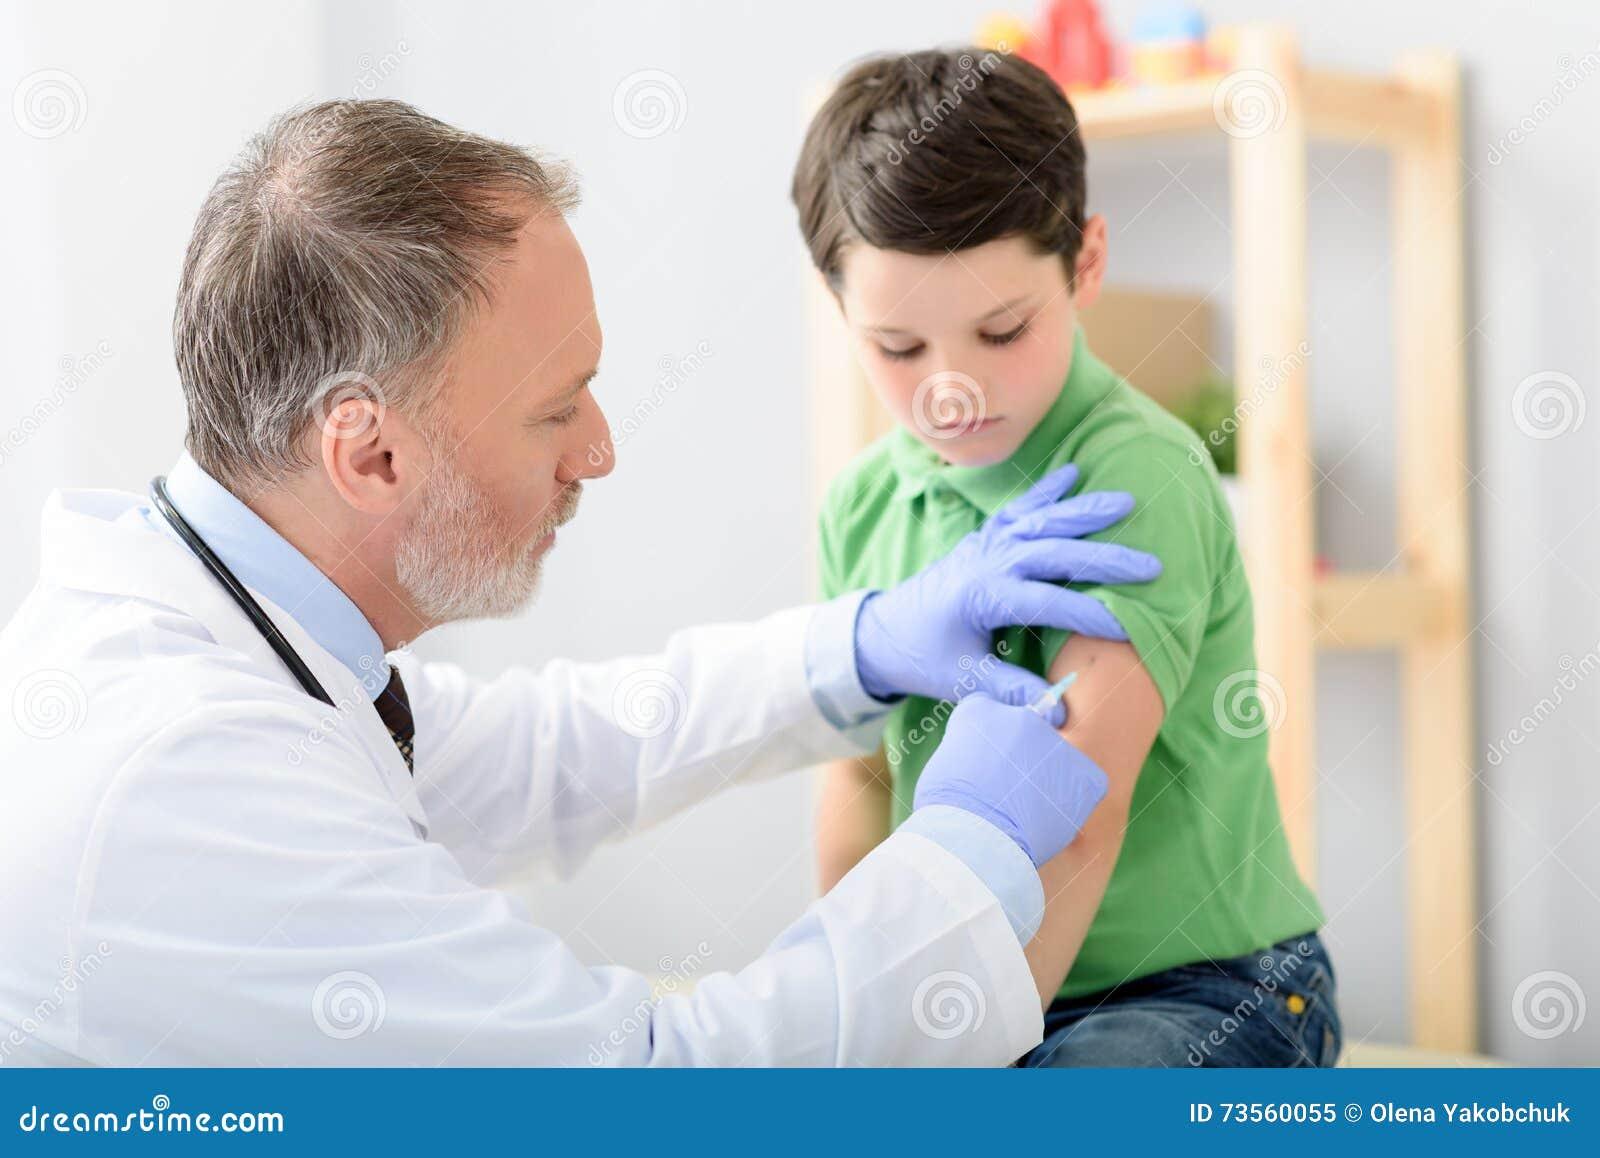 Doctor pediatrician injecting vaccine